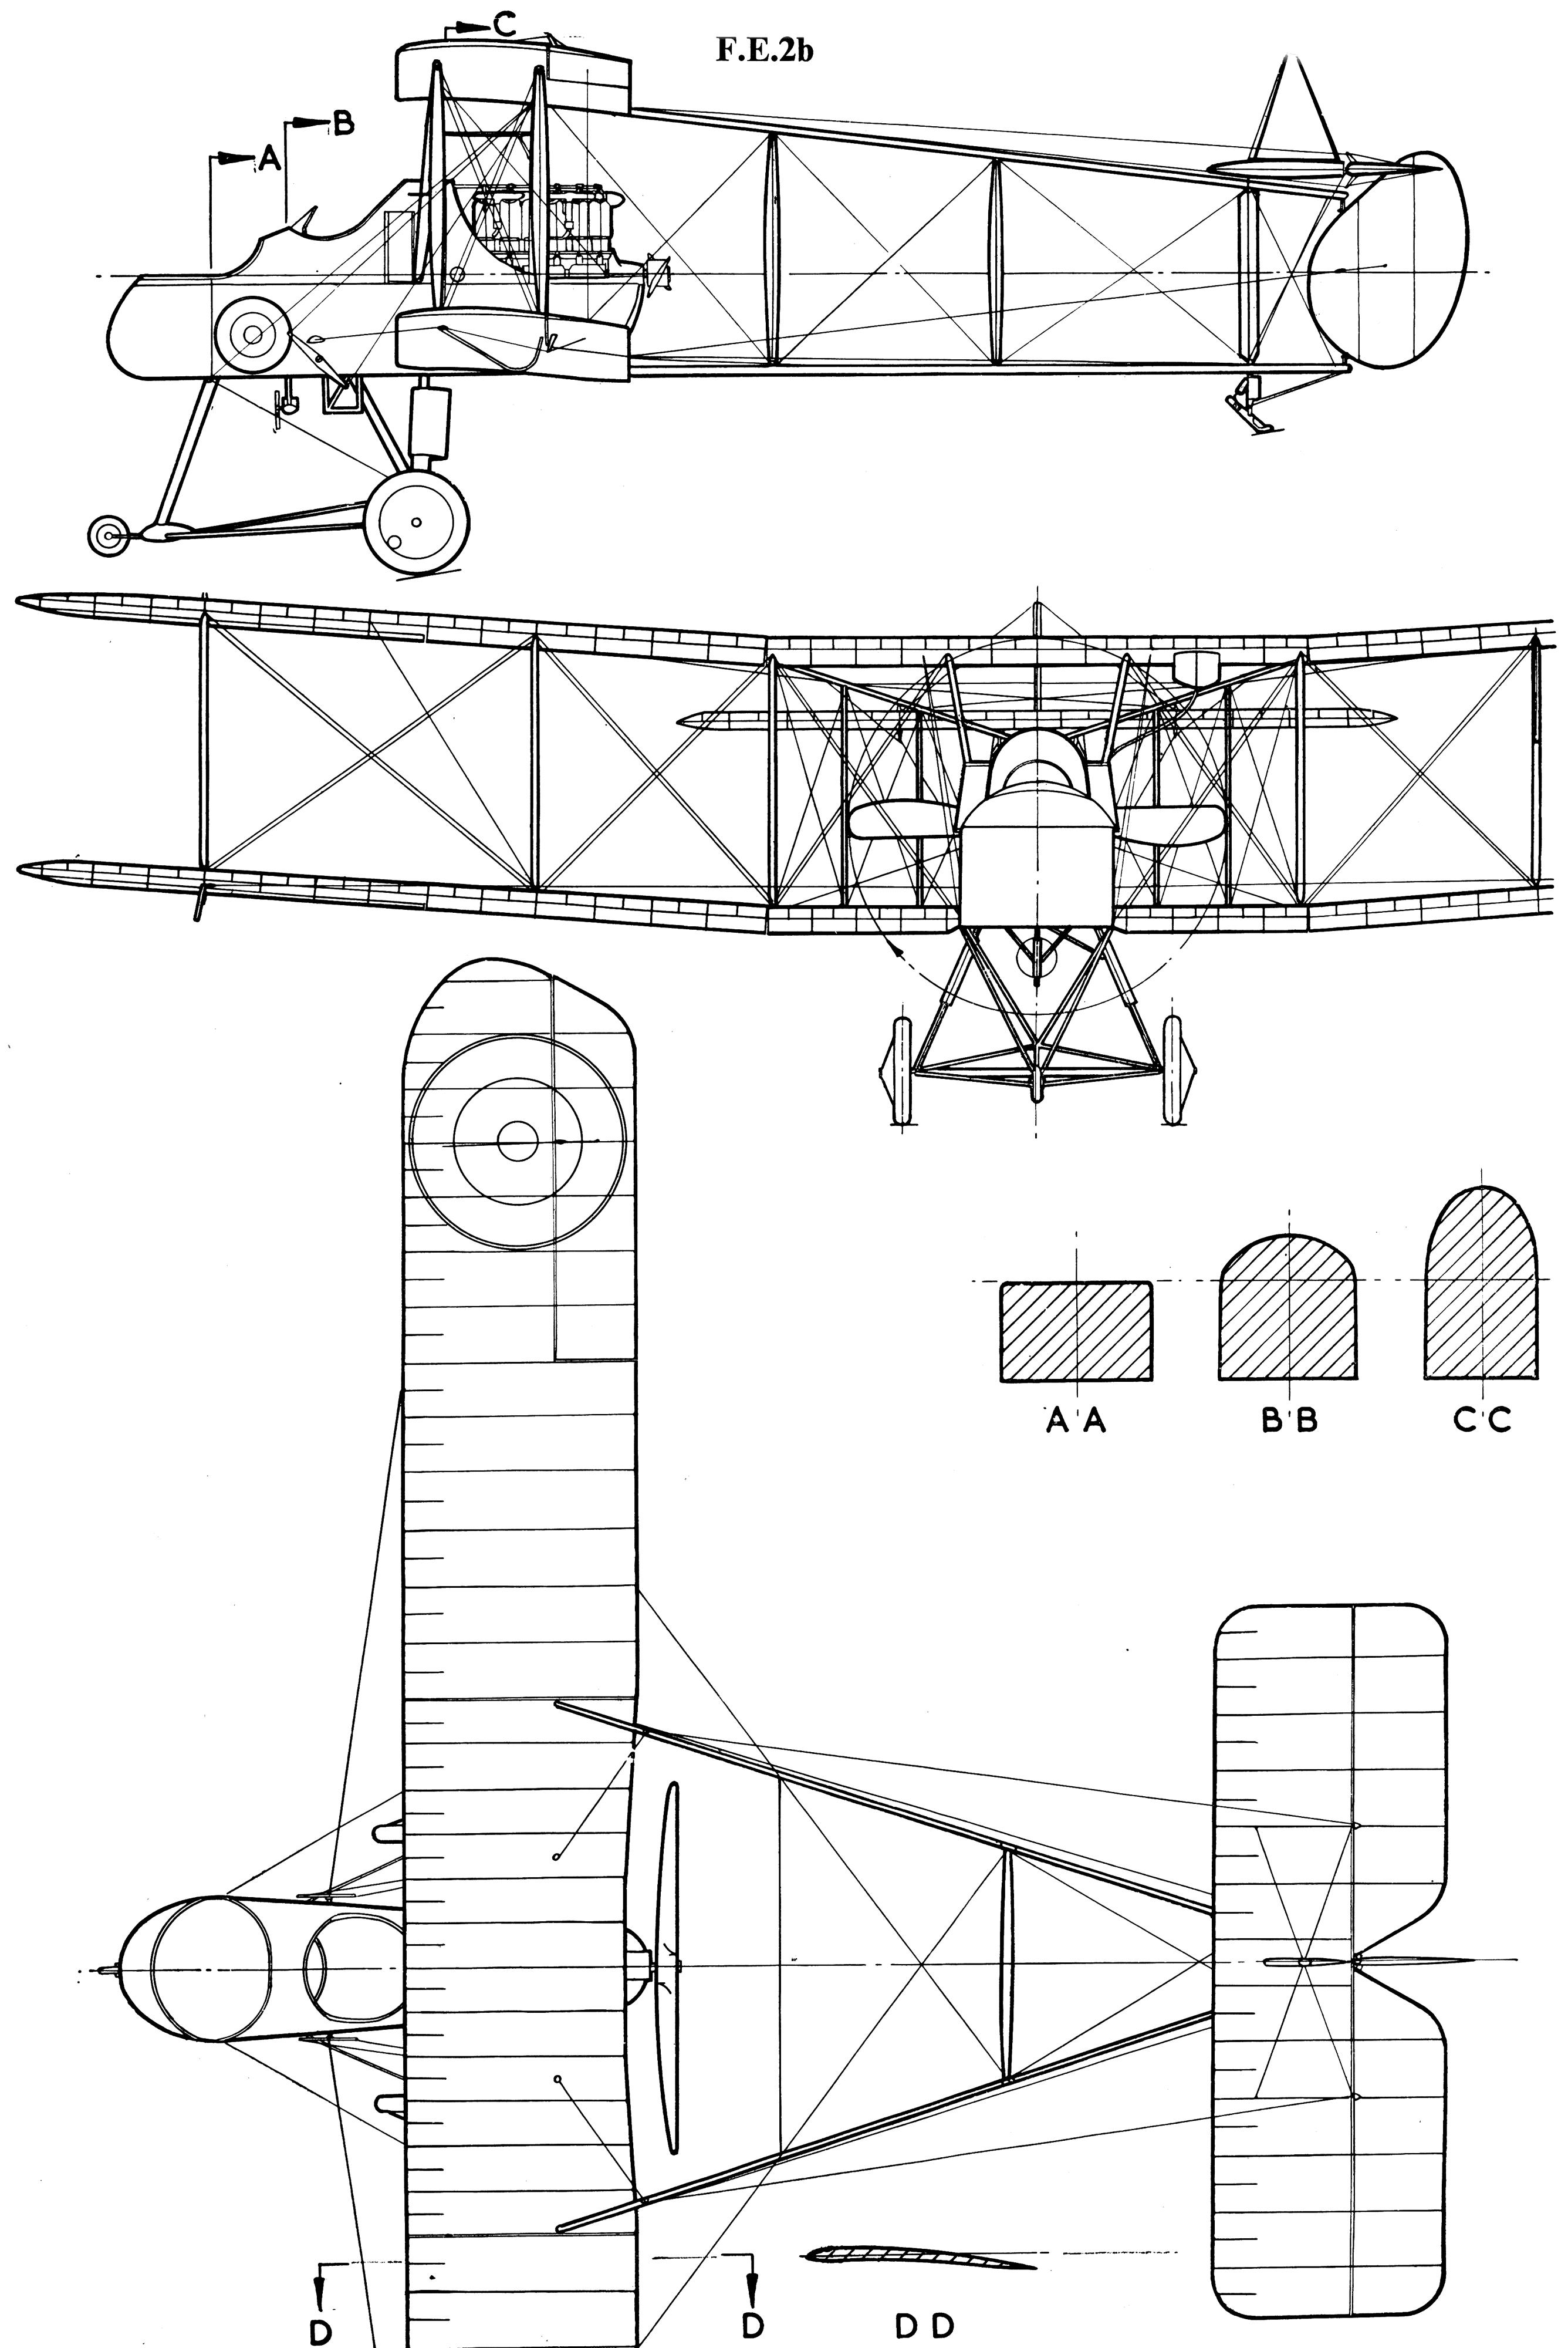 Royal Aircraft Factory F.E.2 blueprint